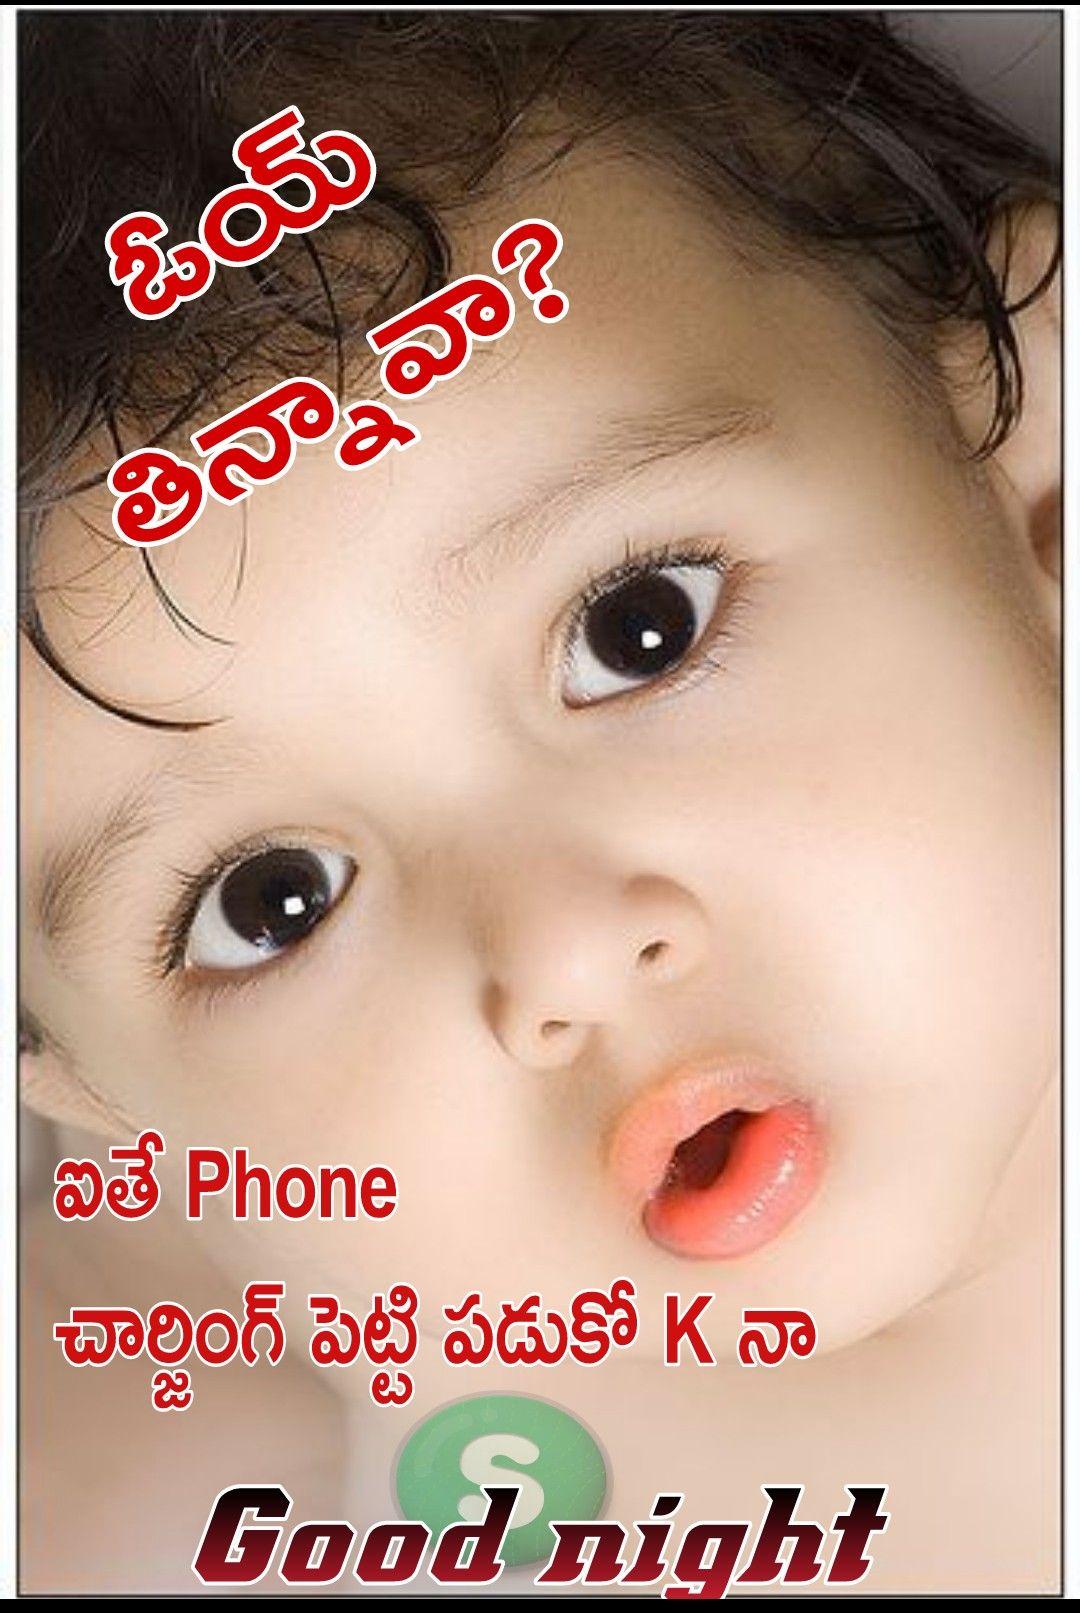 Pin By Sri Lakshmi On Good Night Good Night Quotes Night Wishes Night Quotes